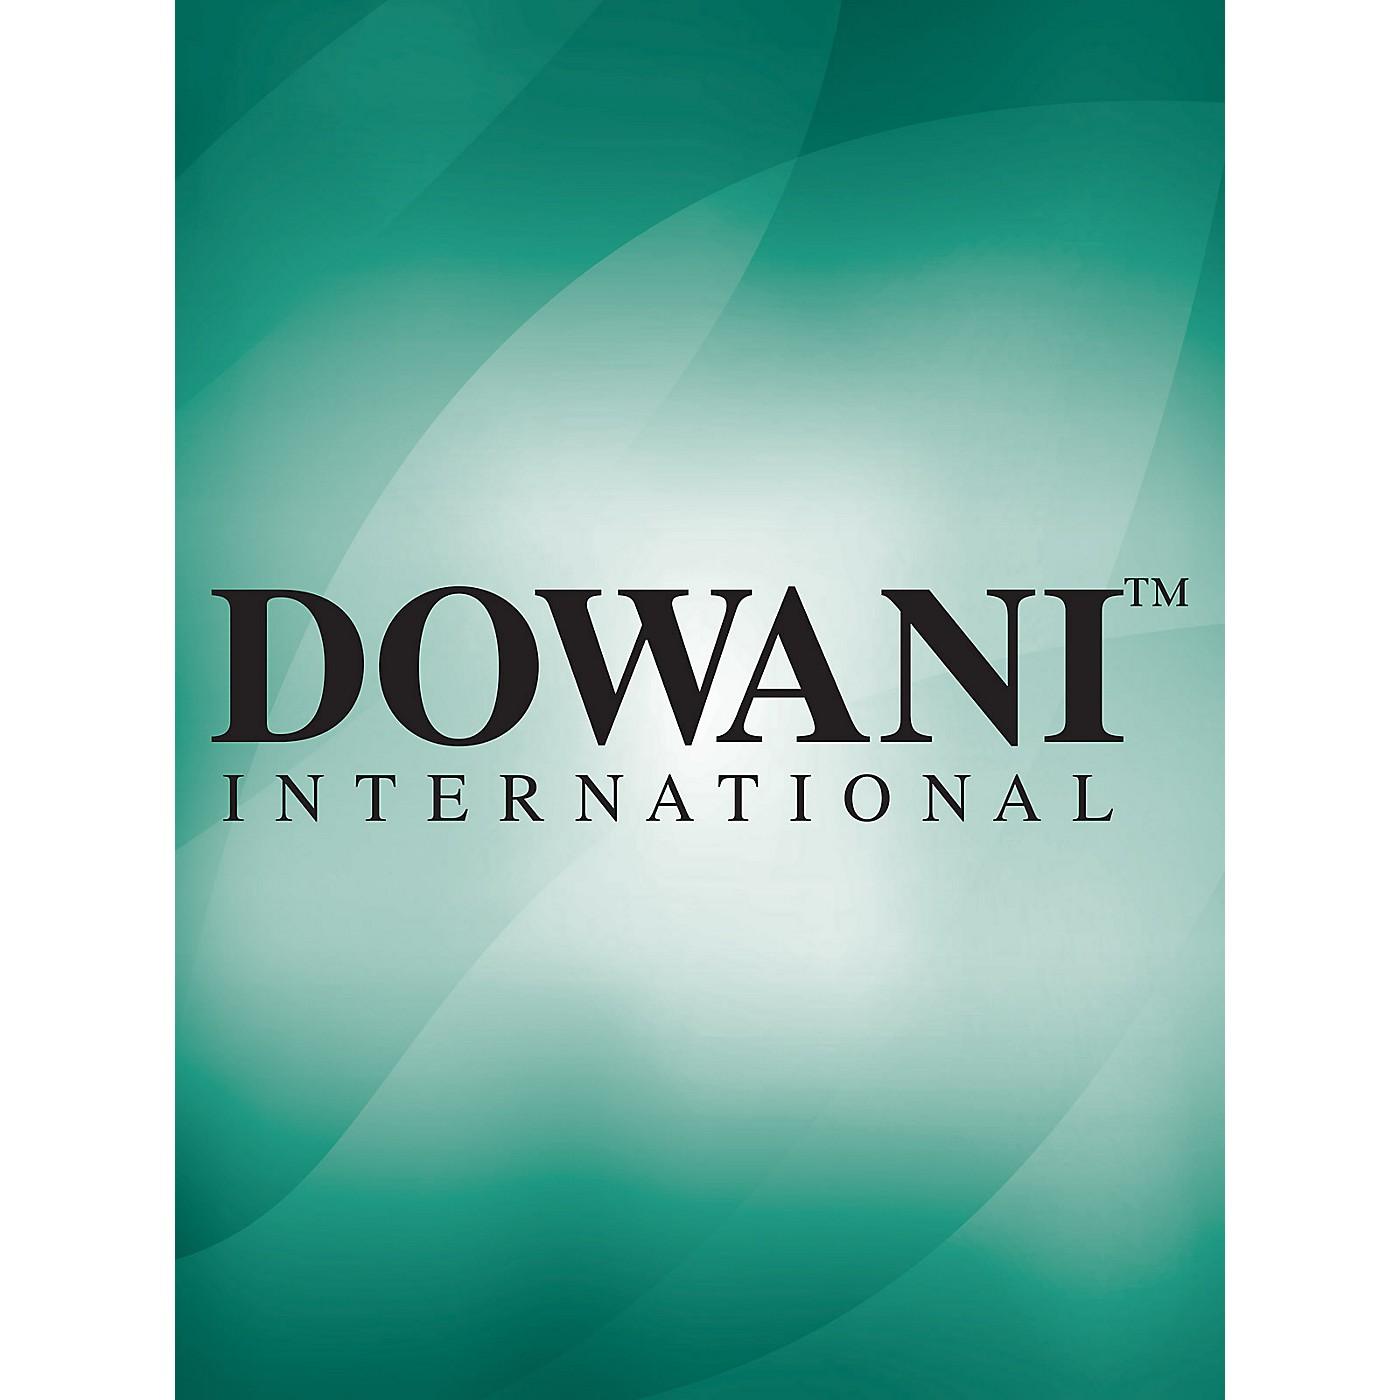 Dowani Editions Concerto for Flute, Strings and Basso Continuo Qv 5: 174 in G Maj Dowani Book/CD by Johann Joachim Quantz thumbnail